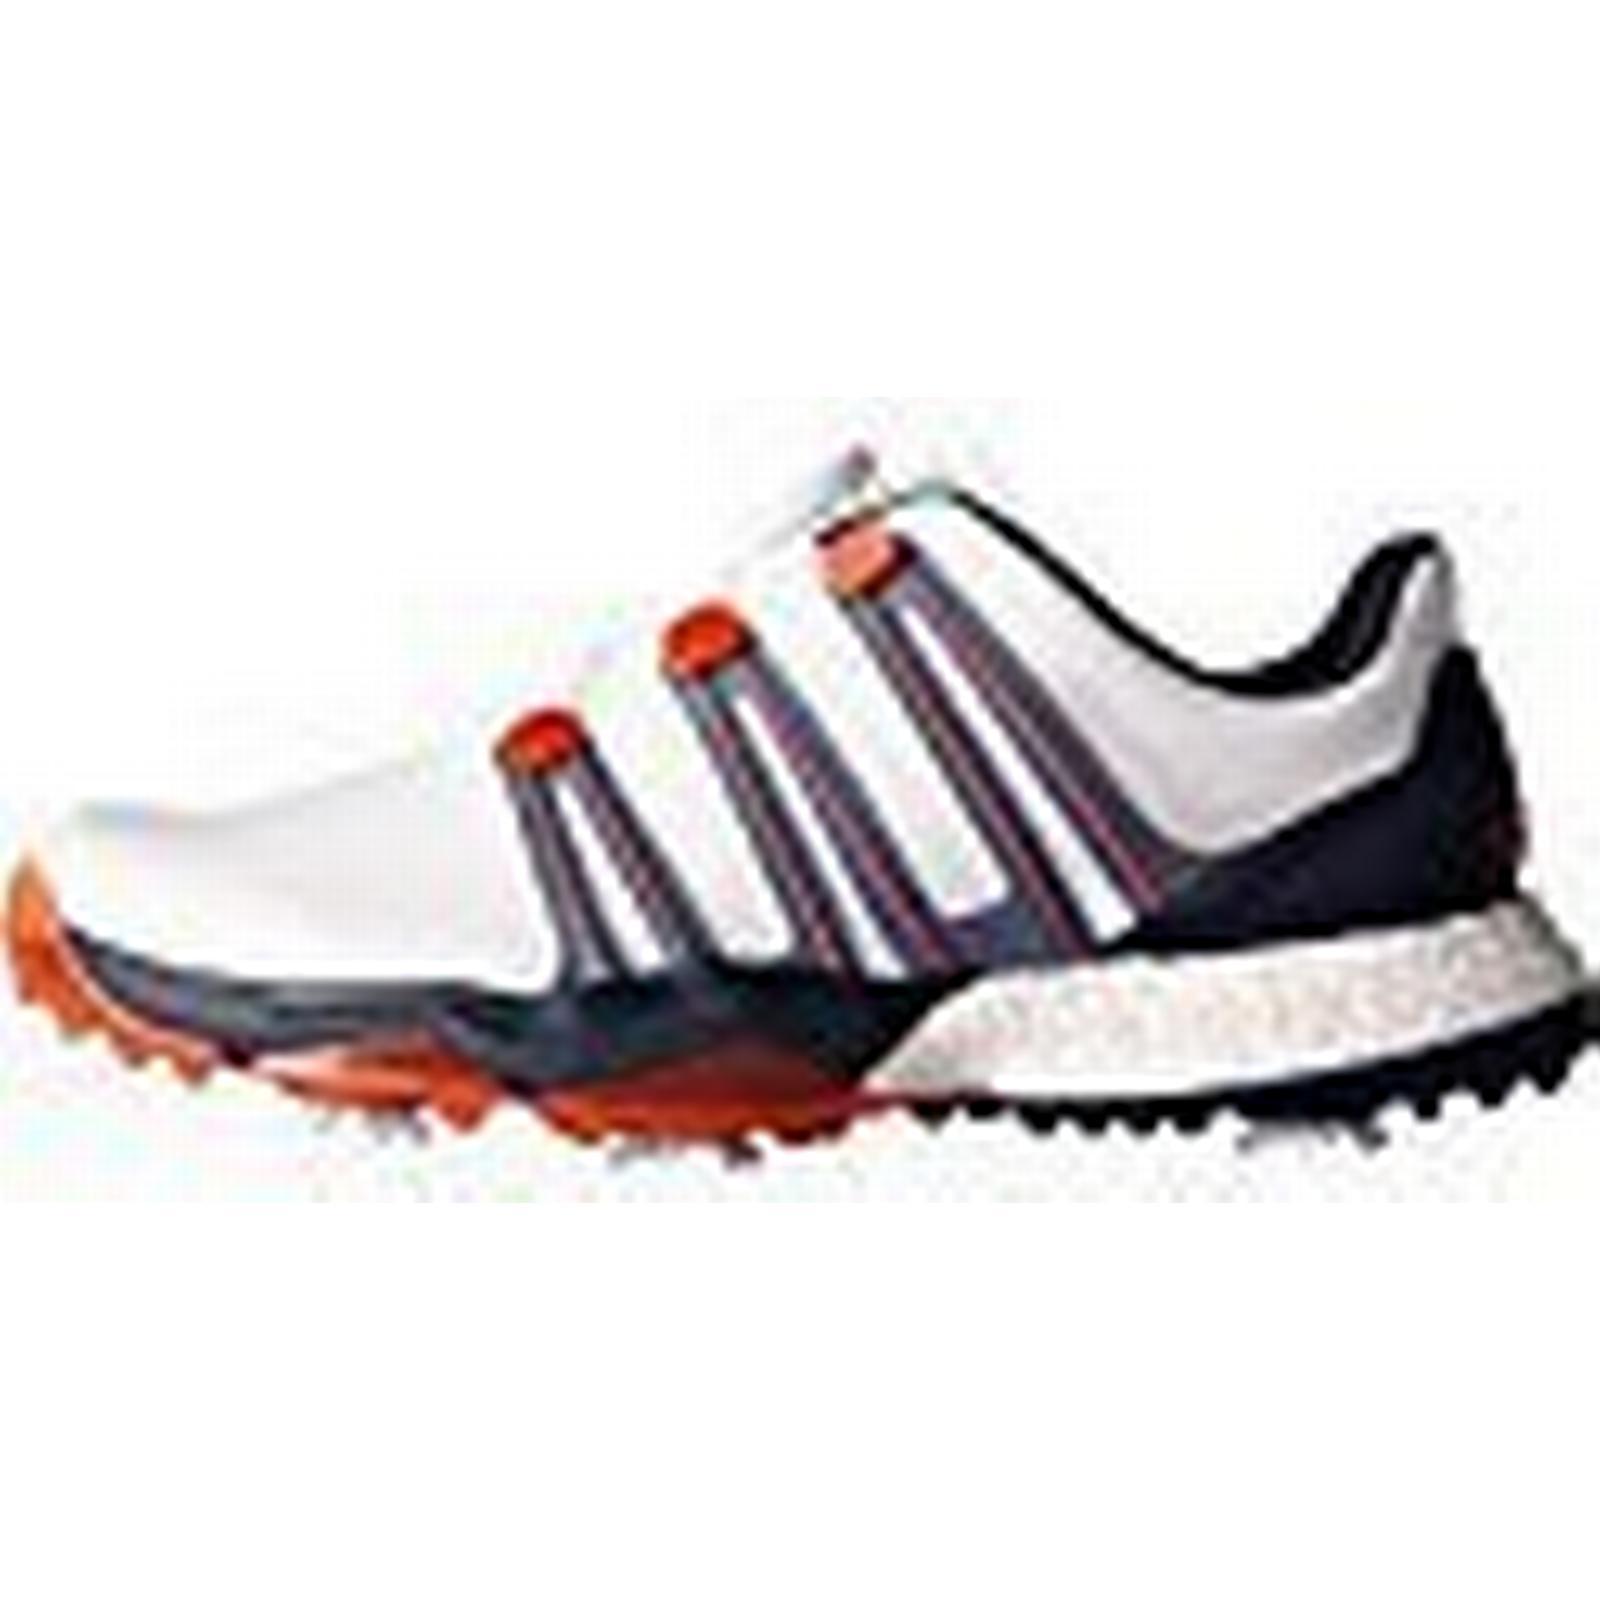 Adidas Powerband Boa Boost Wd, / Men , Multicolored (Weiß / Wd, Orange / Schwarz), 10.5 UK (45.3 EU) a59d0c